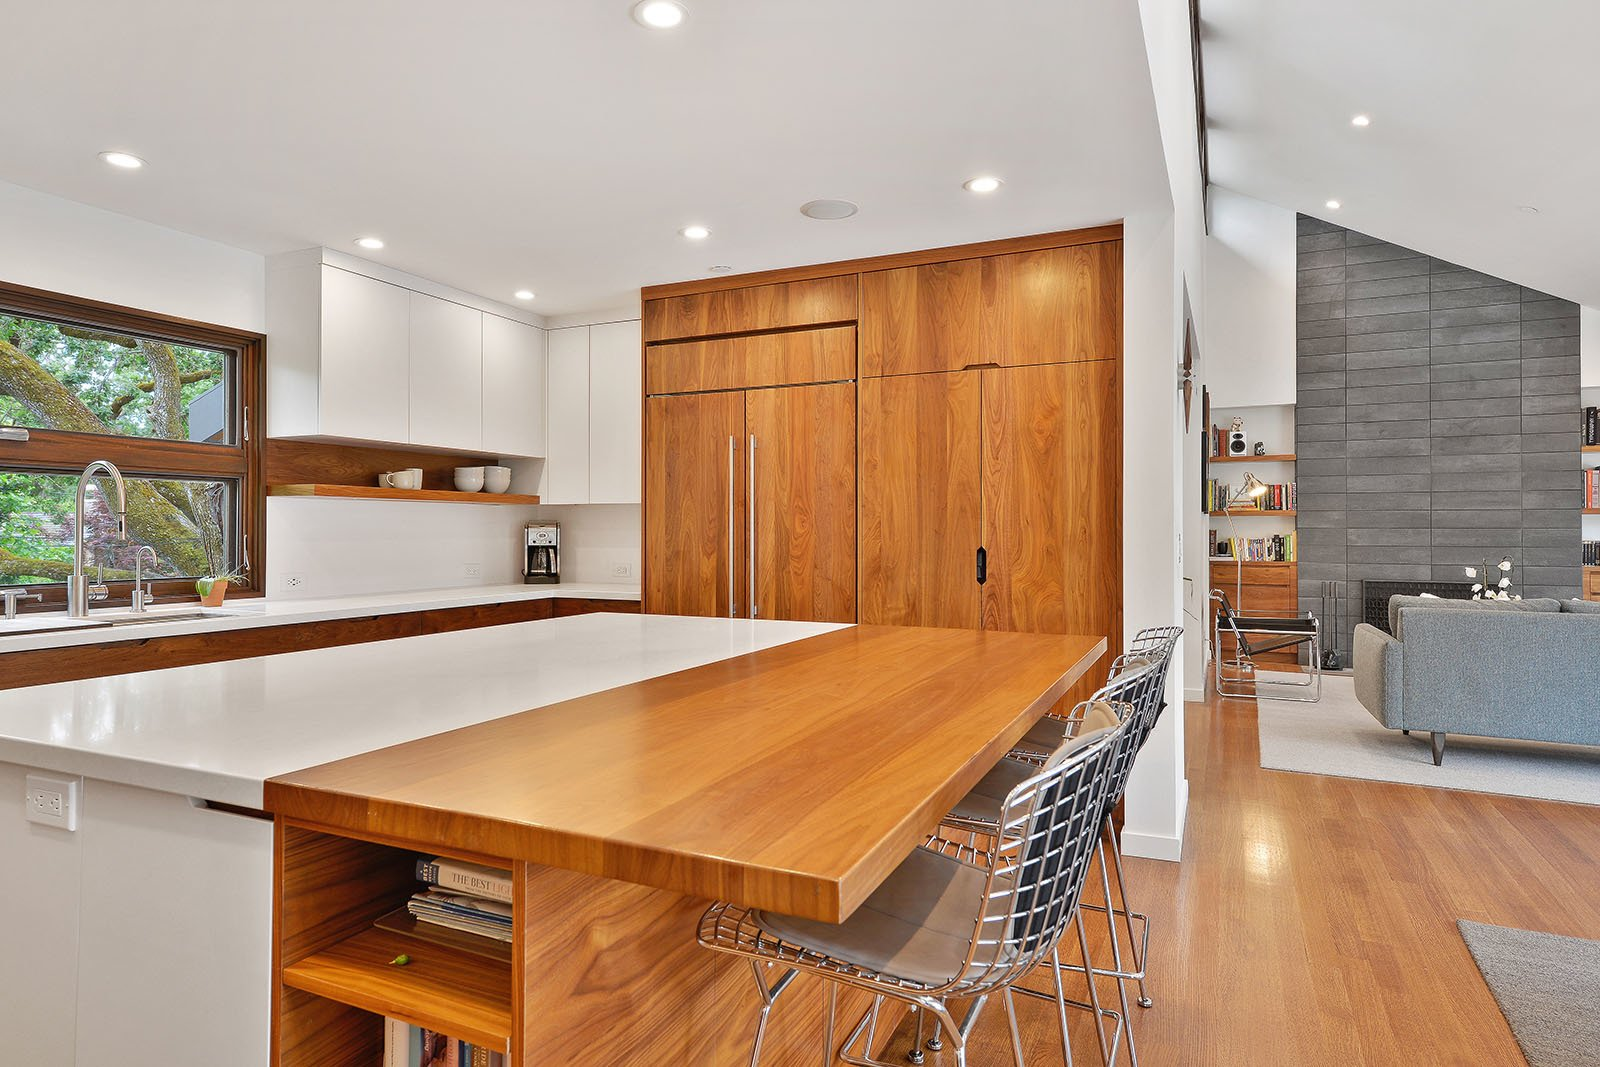 Kitchen Tagged: Kitchen, Wood Cabinet, Engineered Quartz Counter, Stone Slab Backsplashe, Medium Hardwood Floor, Ceiling Lighting, and Refrigerator.  Portola Valley by patrick perez/designpad architecture